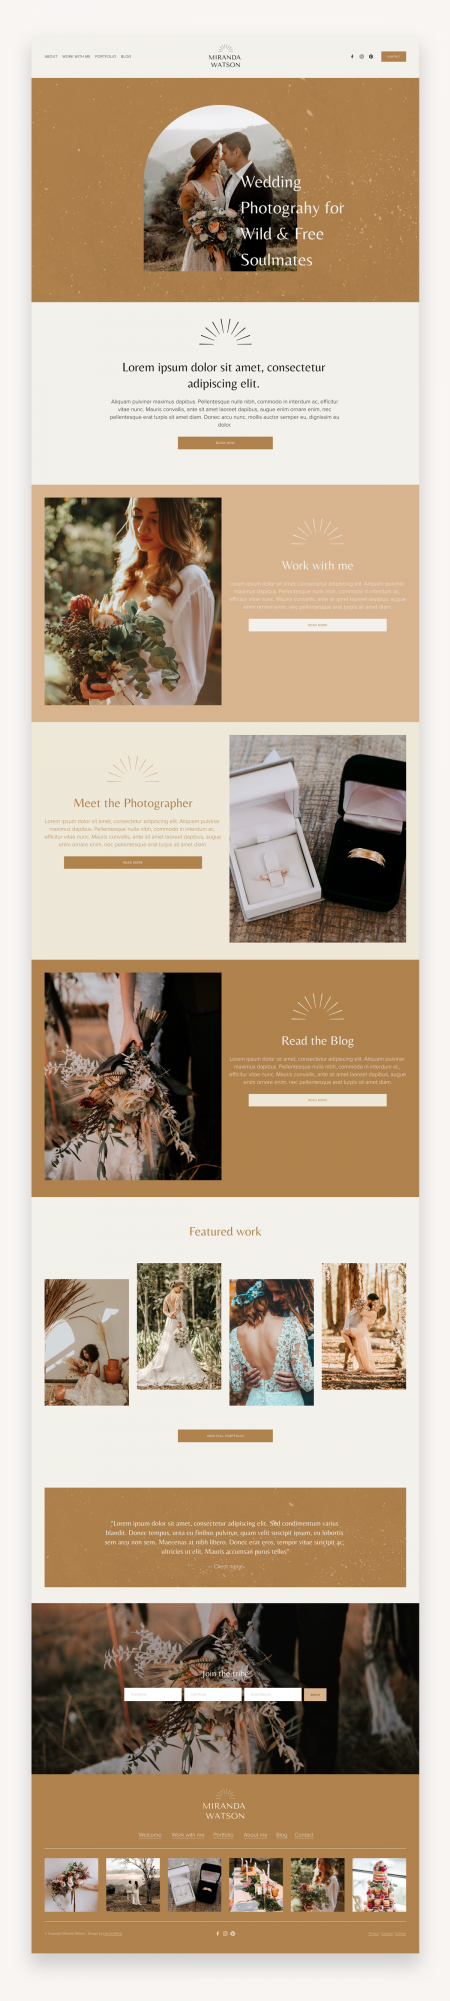 Miranda Photography Squarespace Template